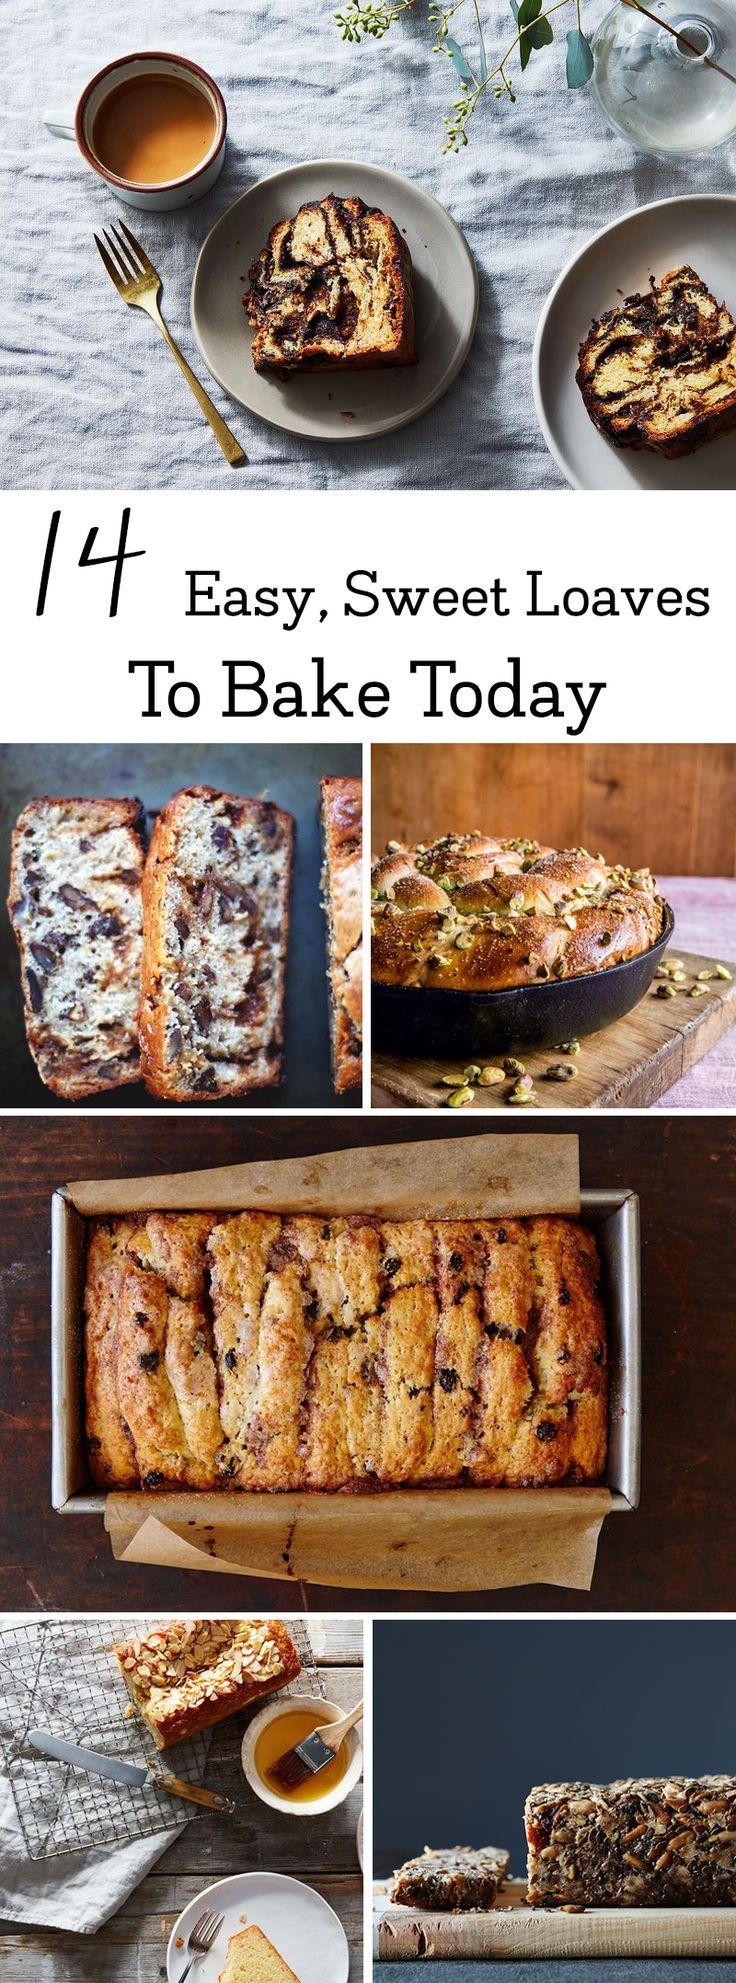 14 Easy #SweetBread #recipes to bake today!